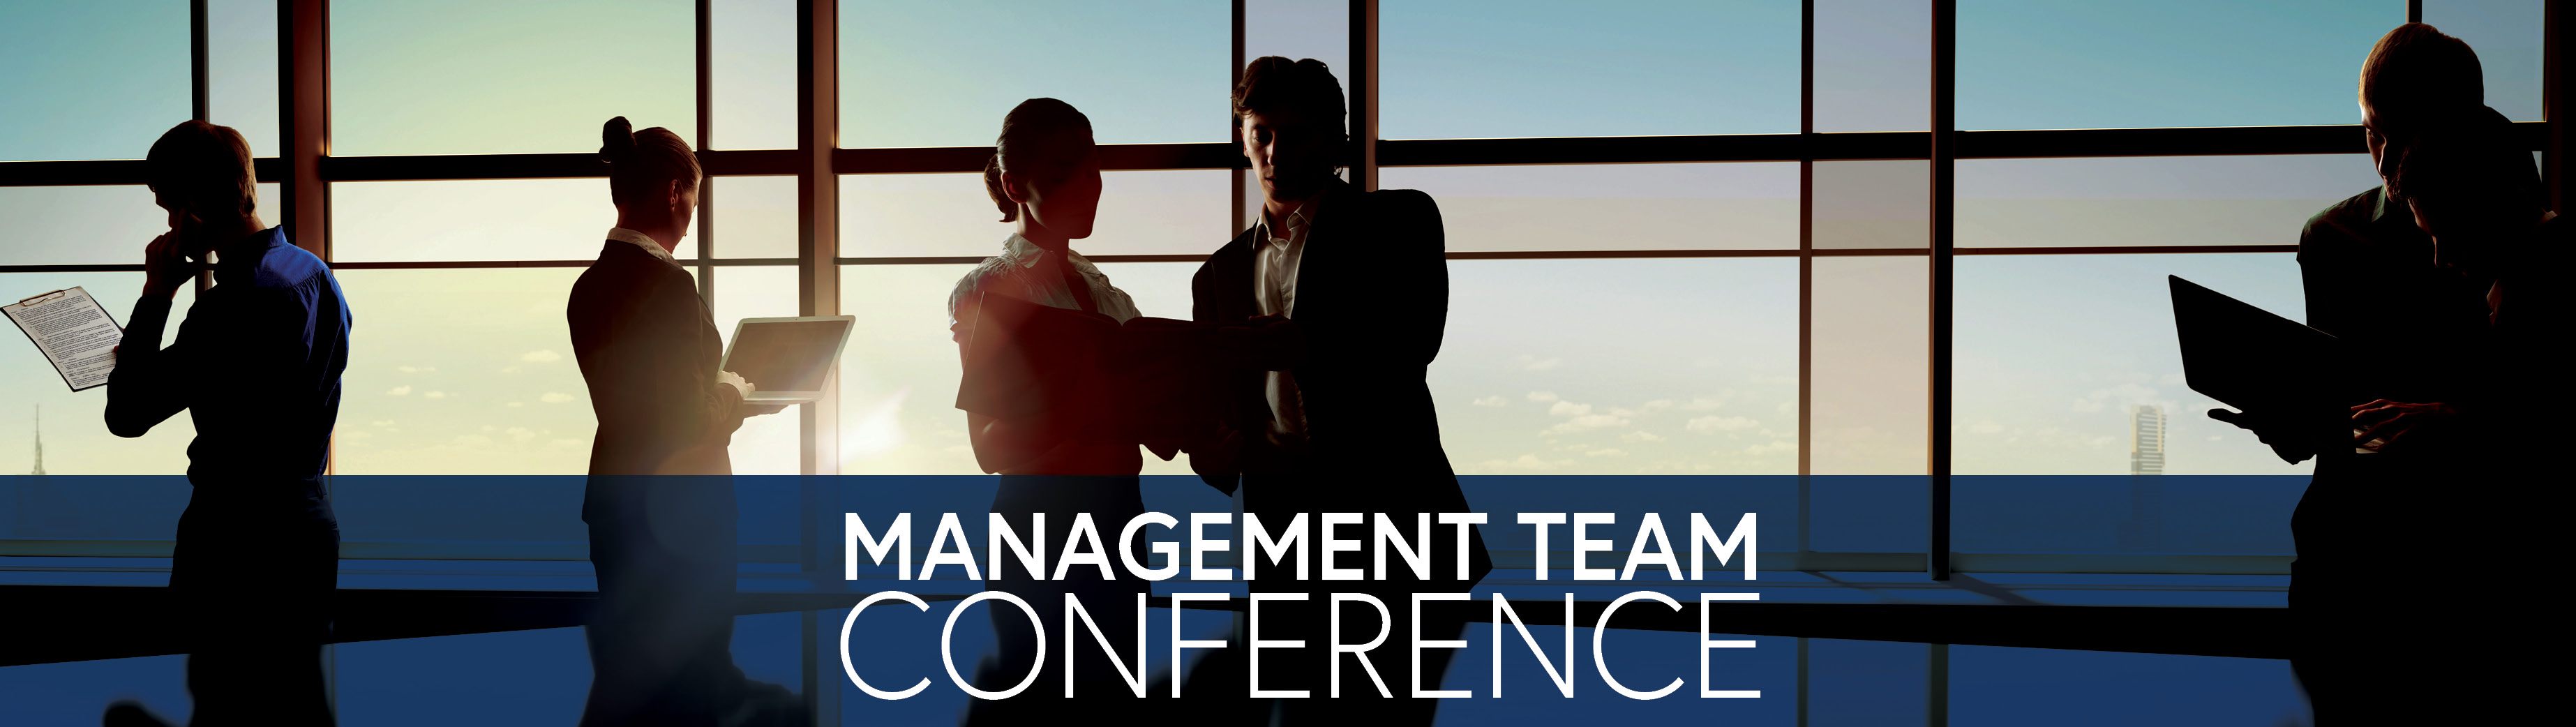 Management Team Conference